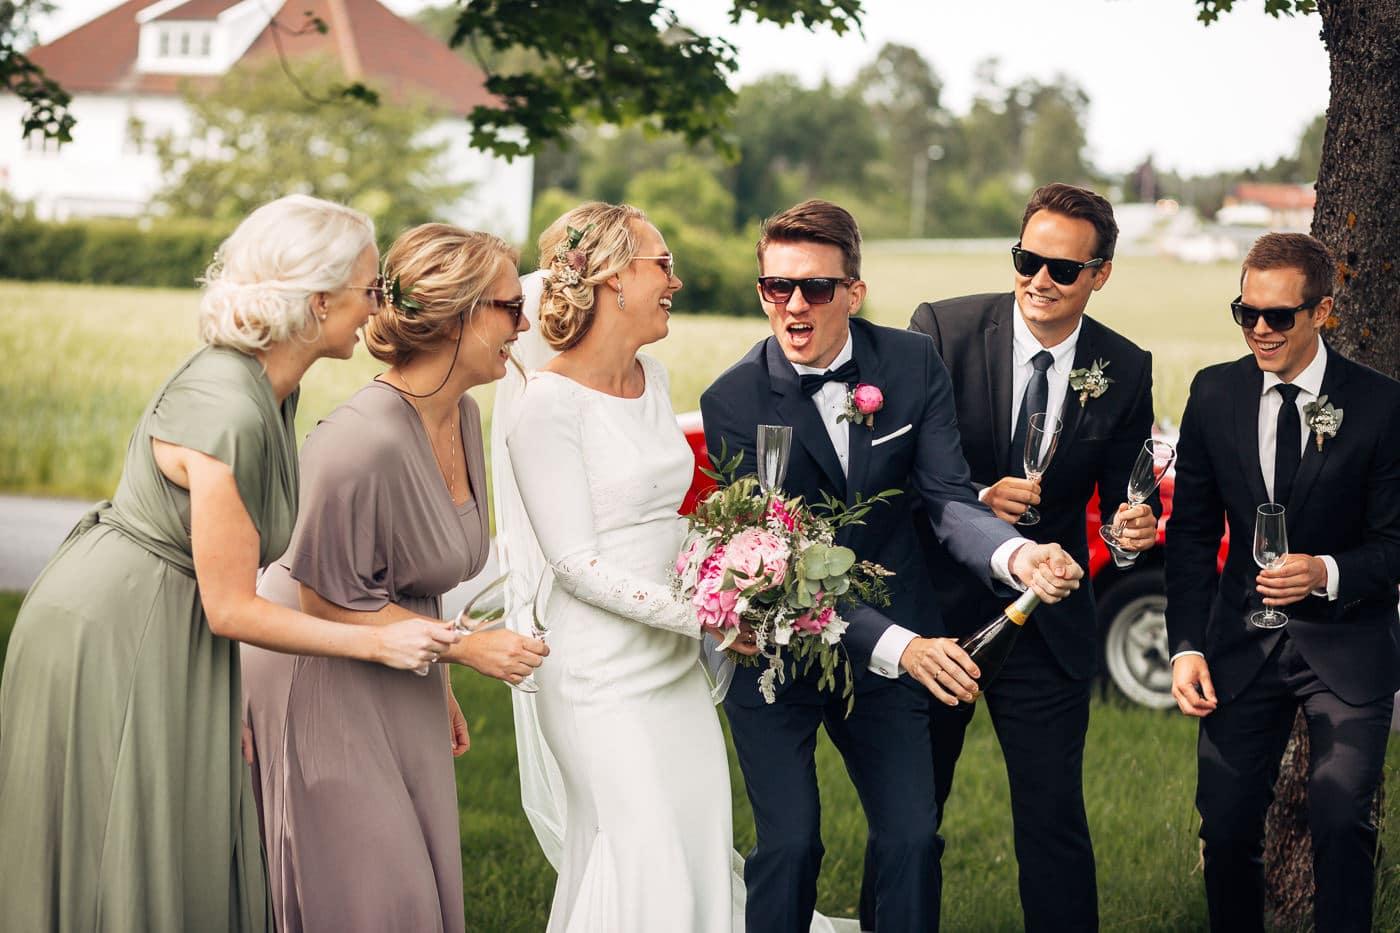 Karoline & Andreas - bryllup i Østfold med magiske detaljer Bryllup Fredrikstad Fotograf 44